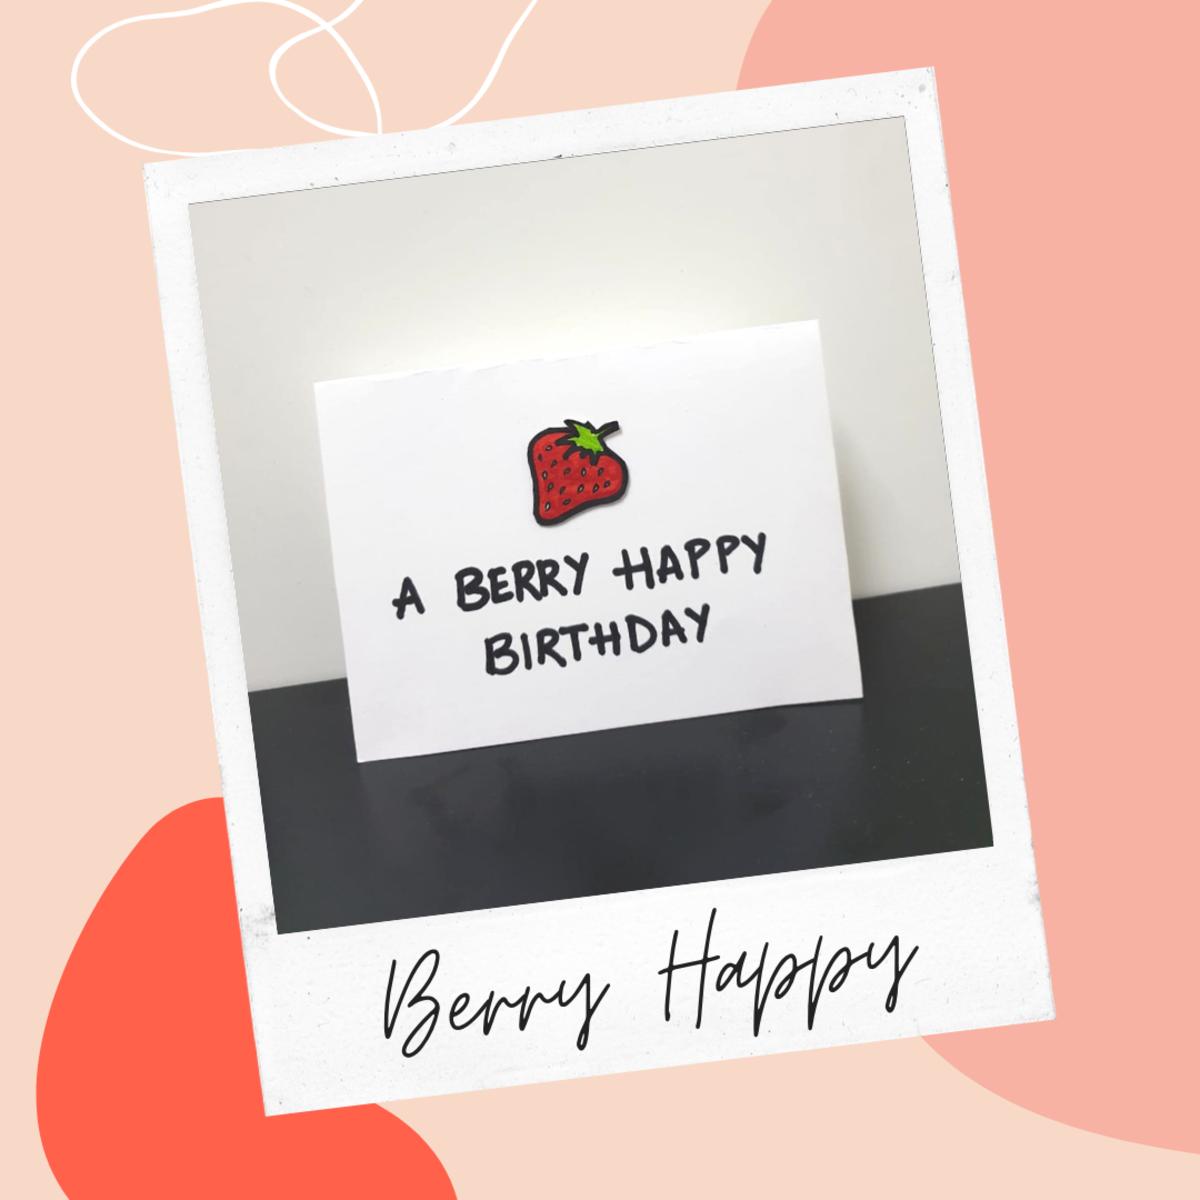 Berry Happy Birthday Greeting Card Idea